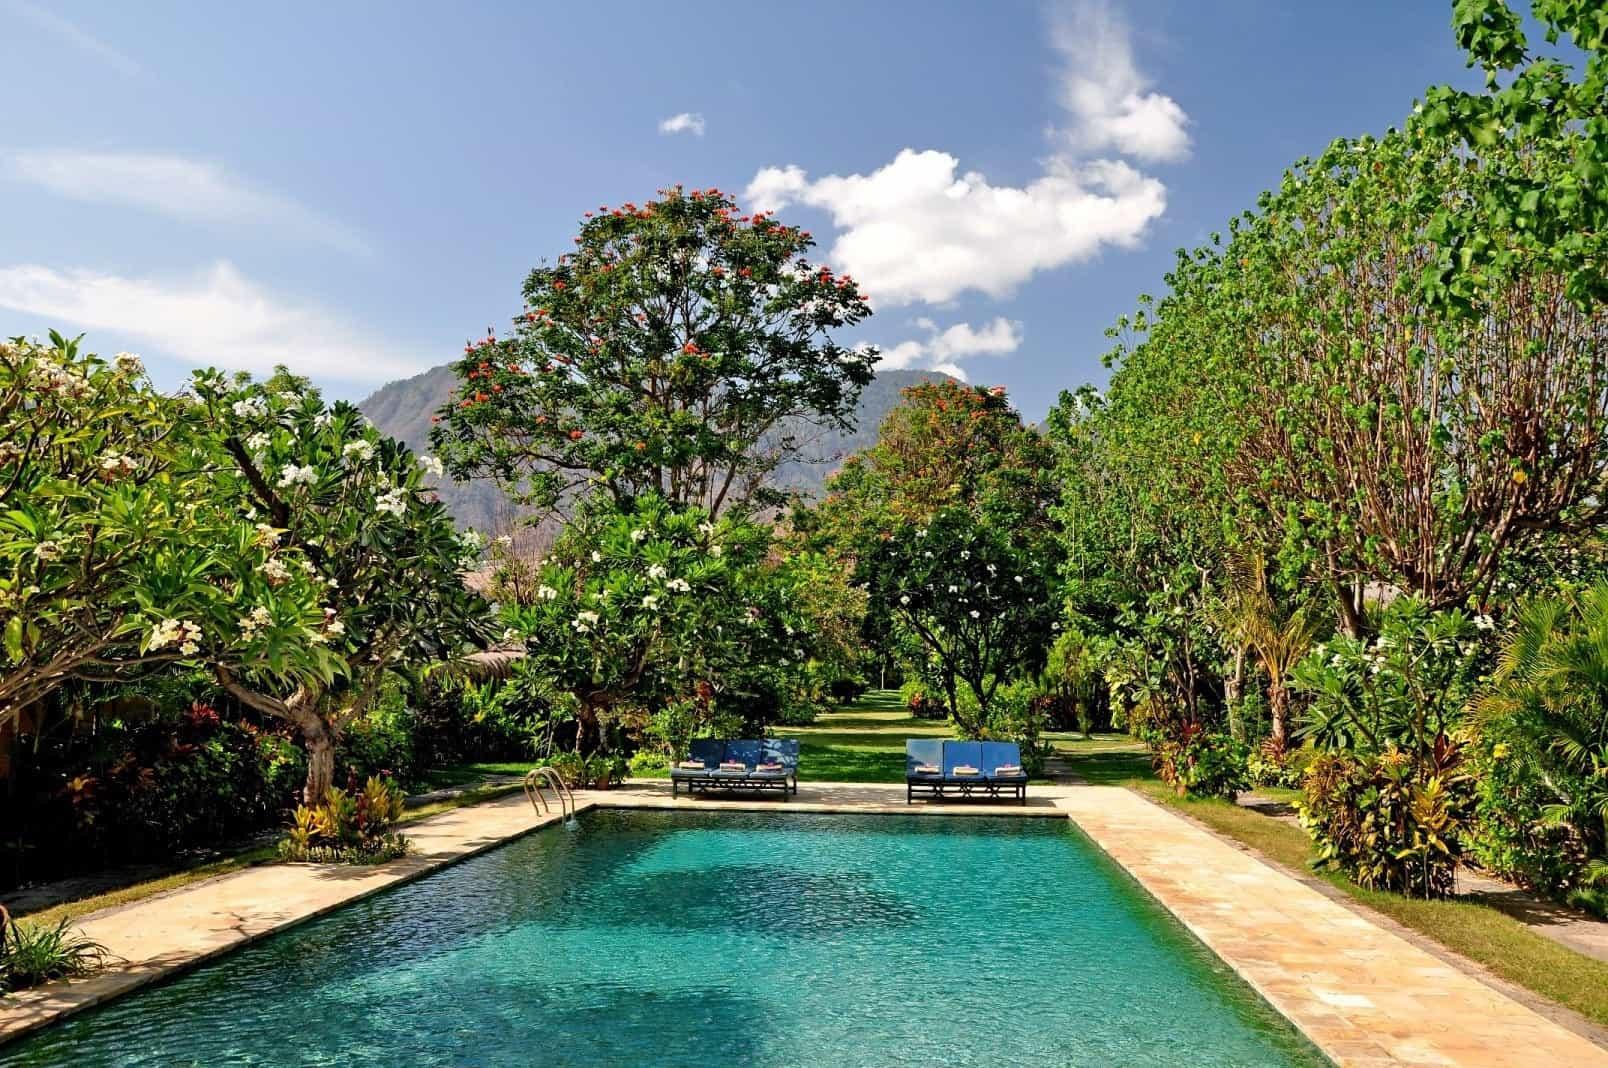 hotel bali pemuteran piscine extérieure